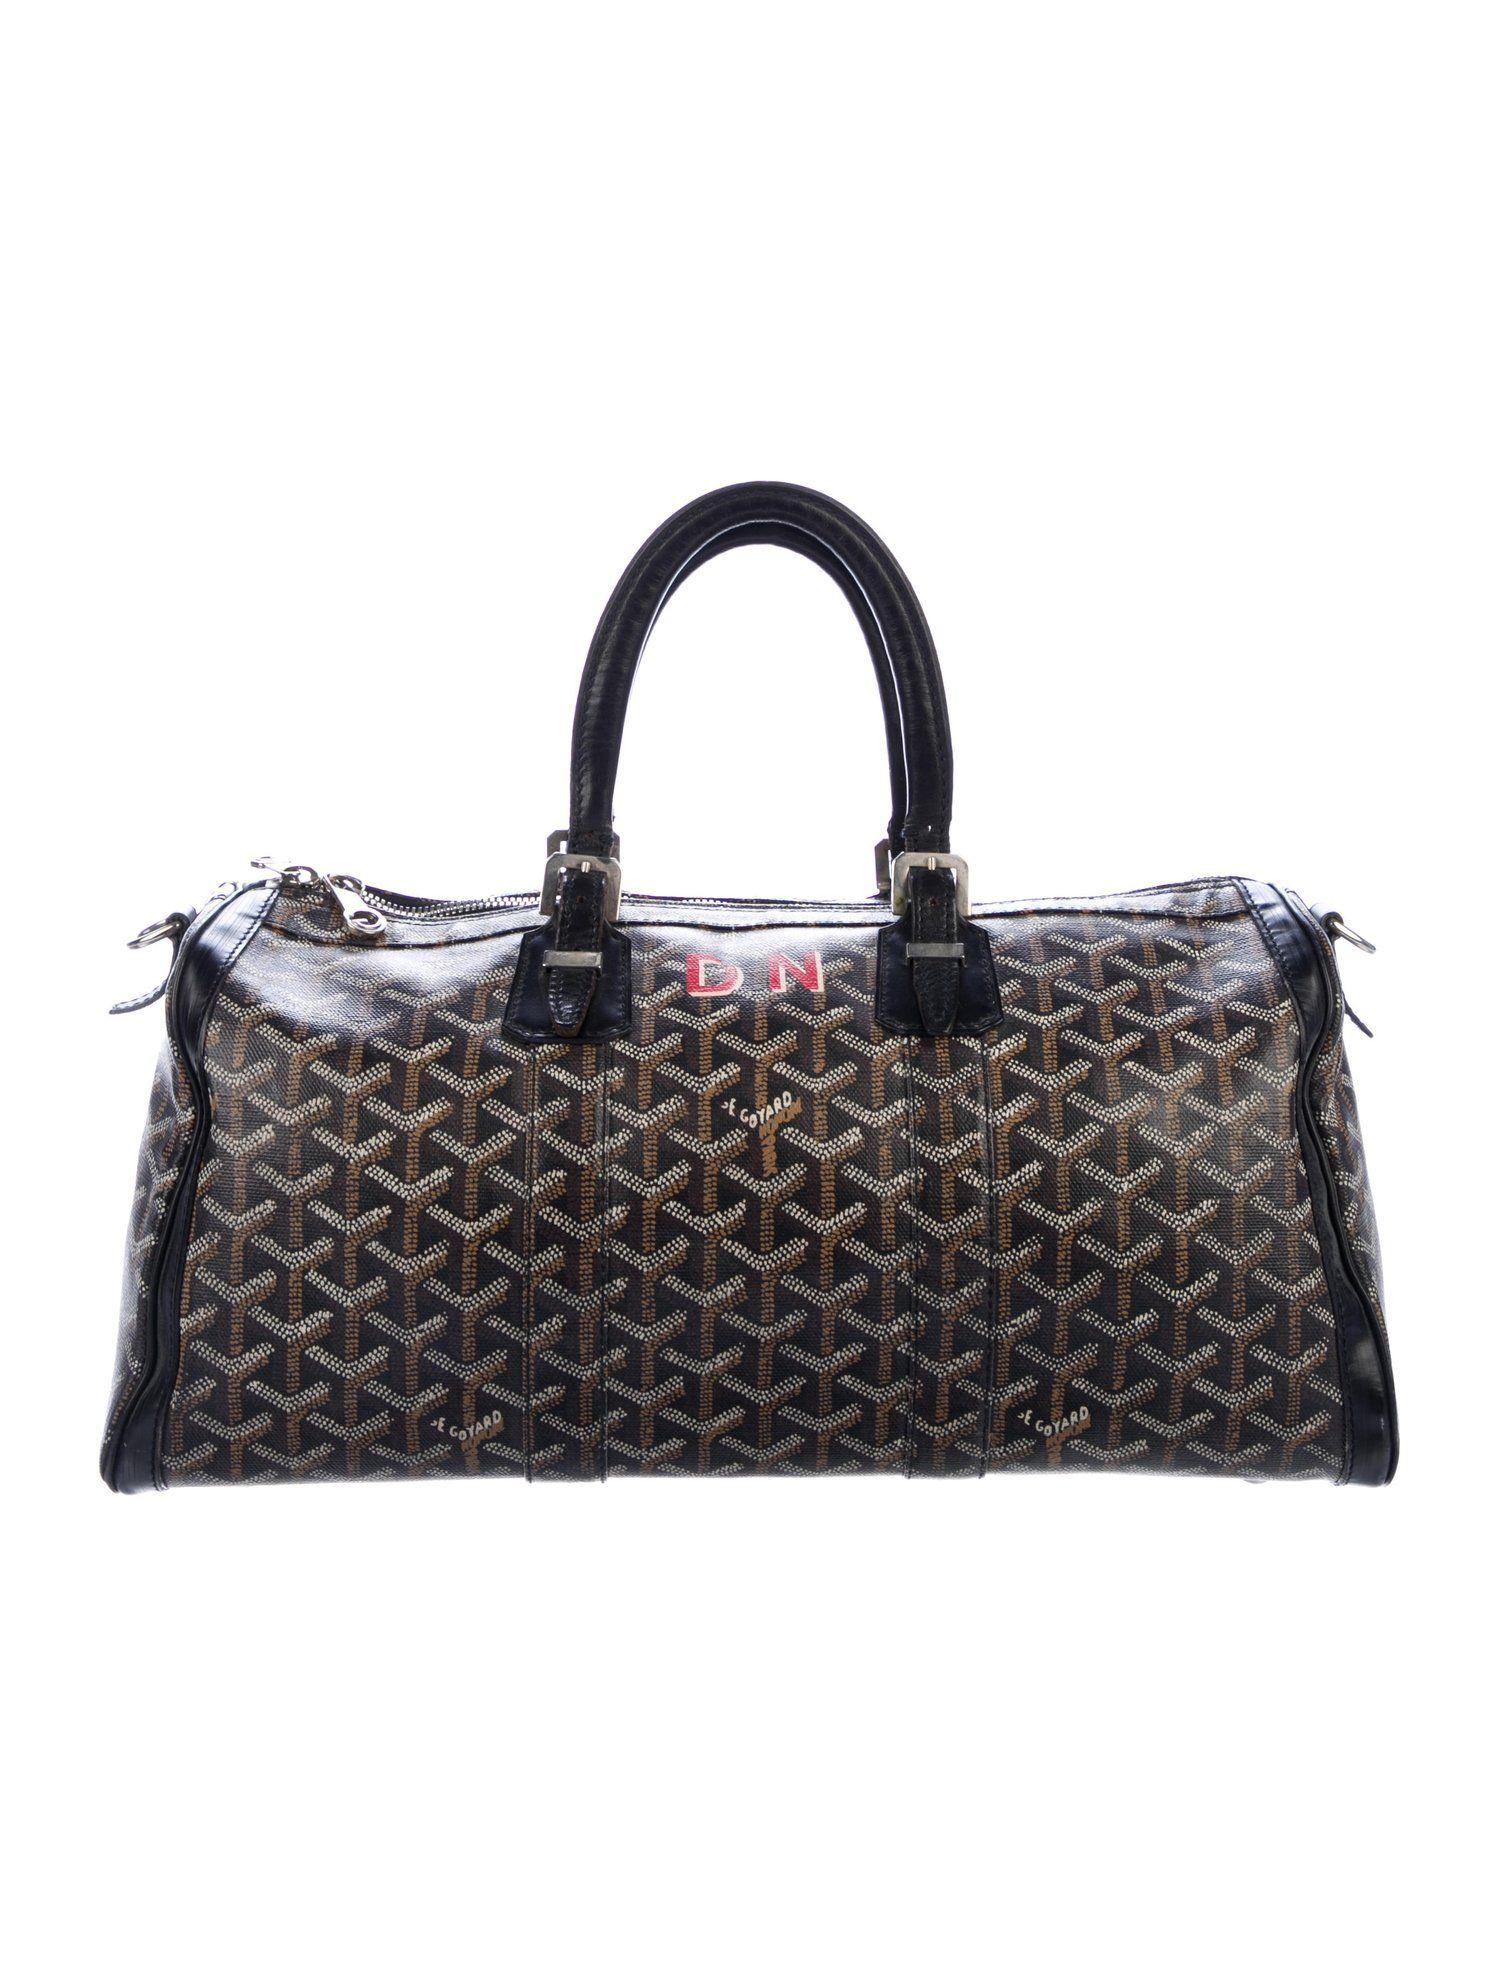 Goyard Bags Goyard Bag Bags Goyard Handbags